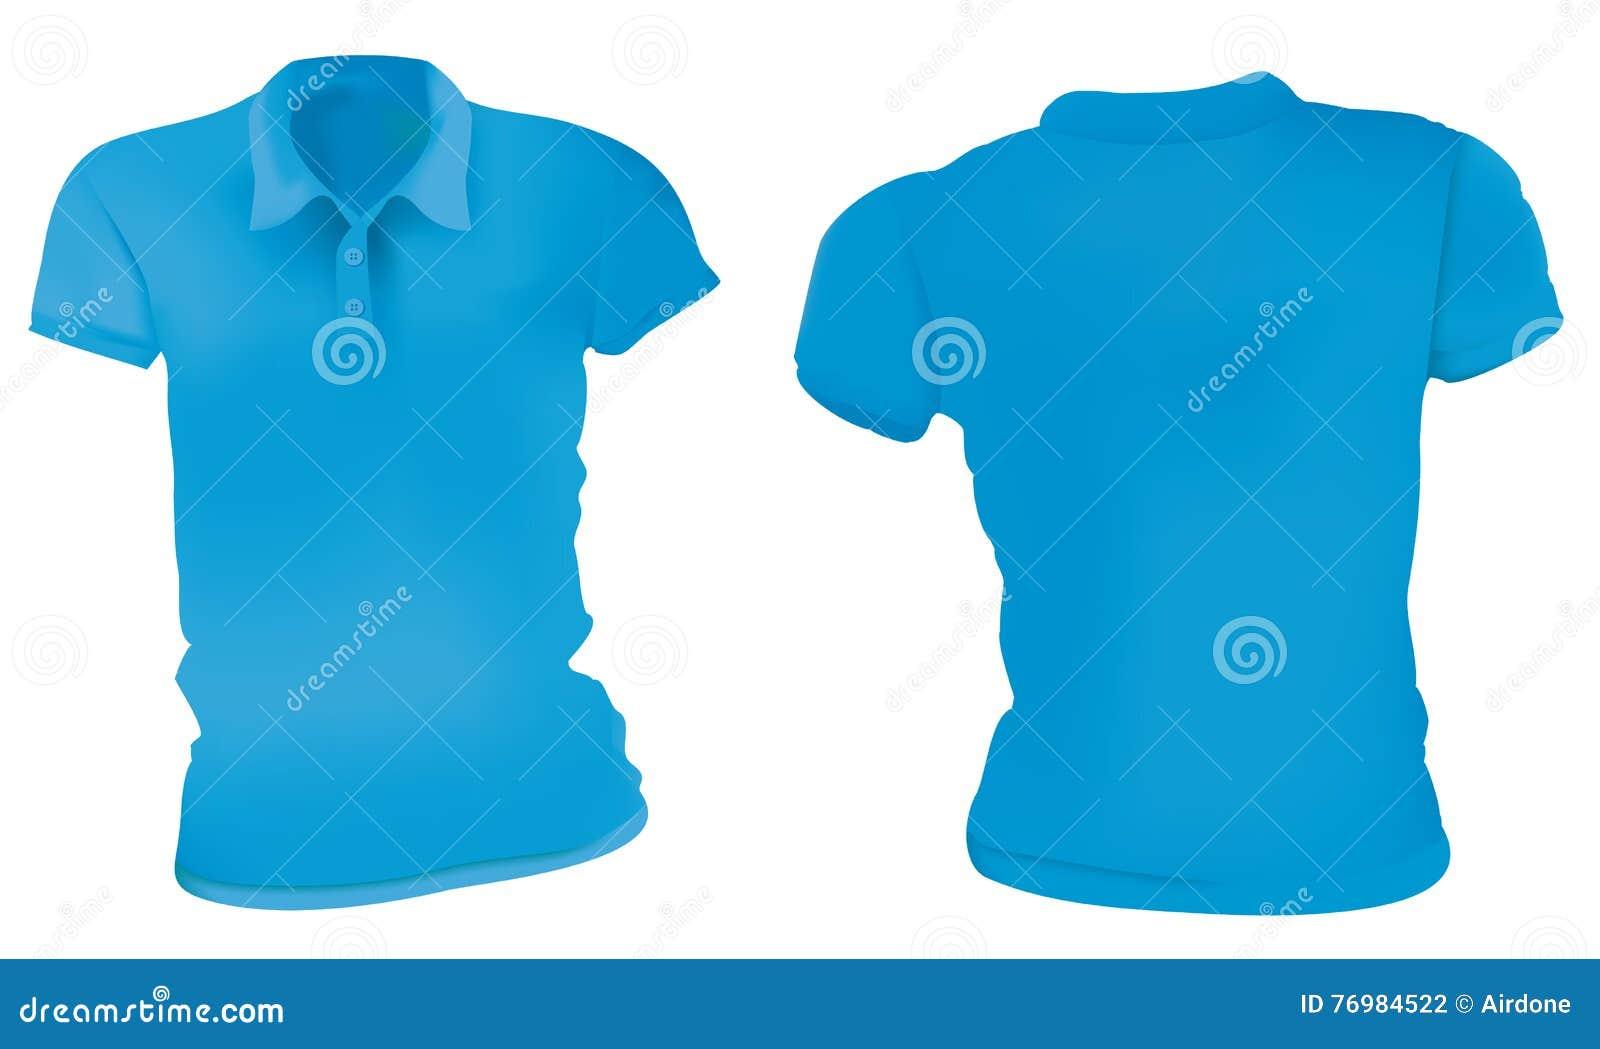 Women Blue Polo Shirts Template Stock Vector - Image: 76984522